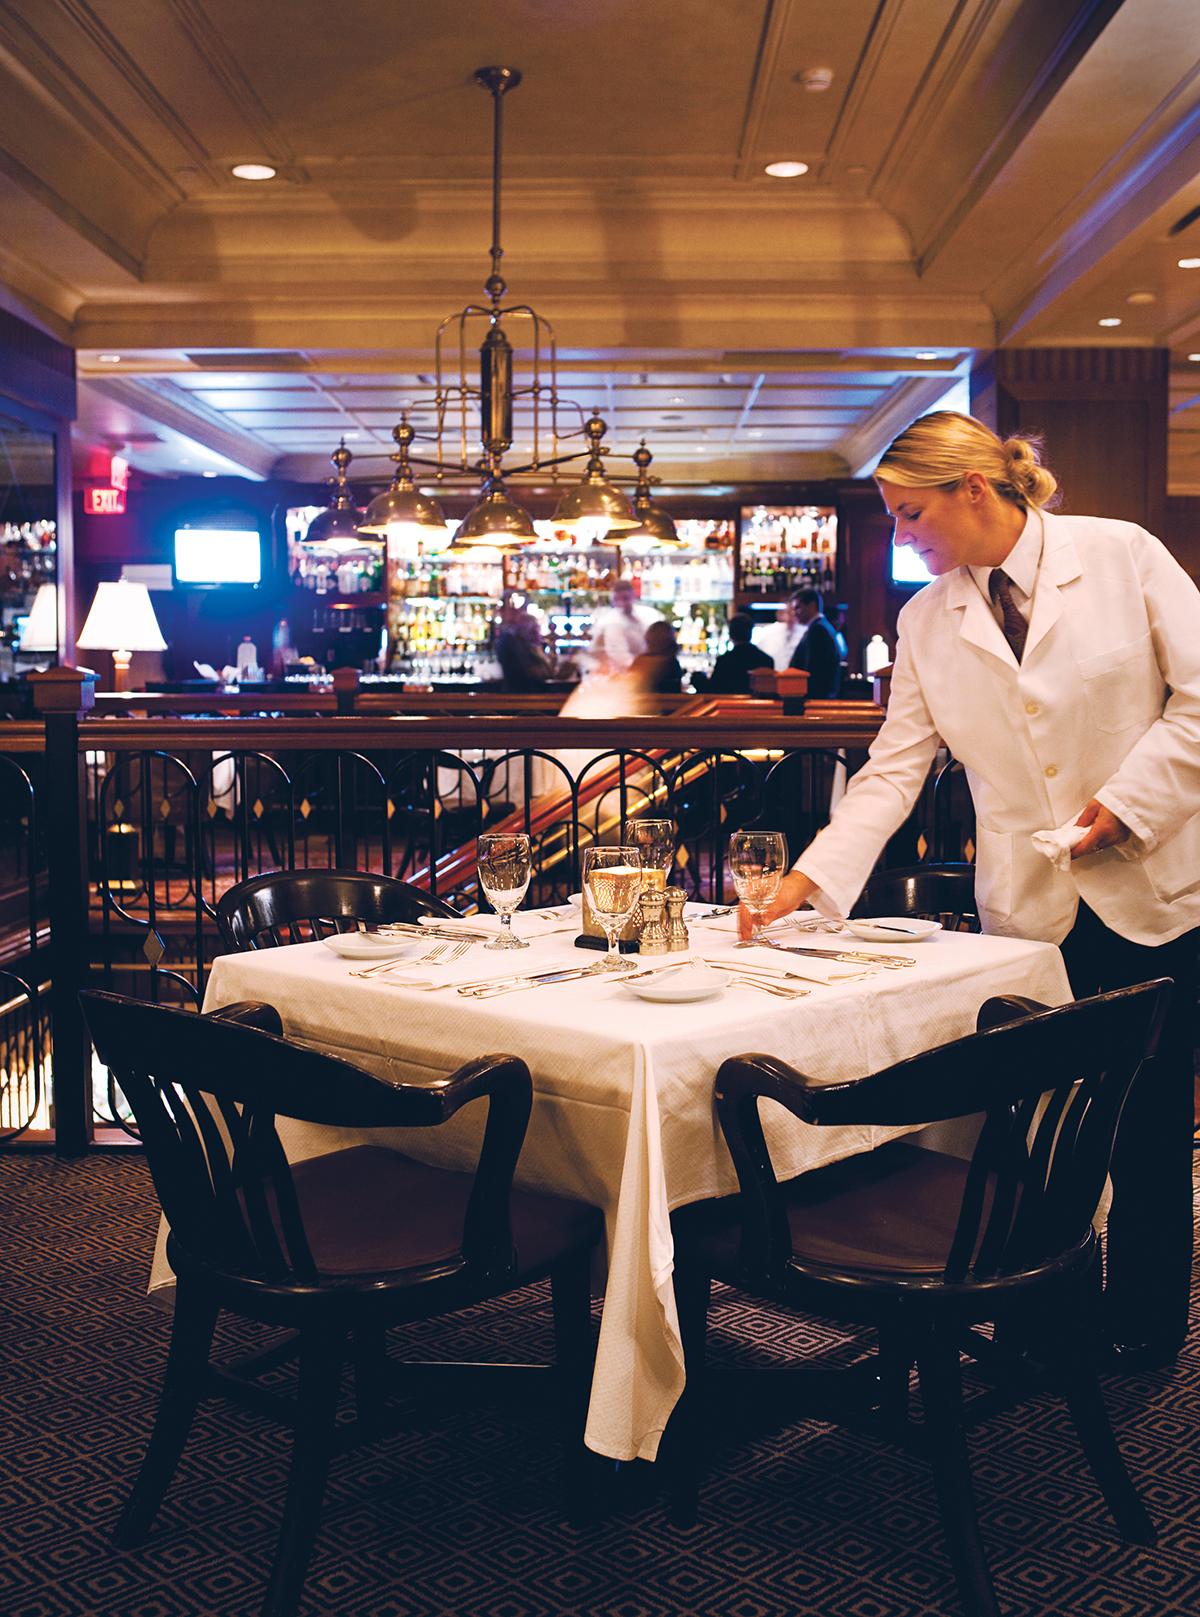 Table 608 at Back Bay steakhouse Grill 23. Photograph by Keller + Keller.